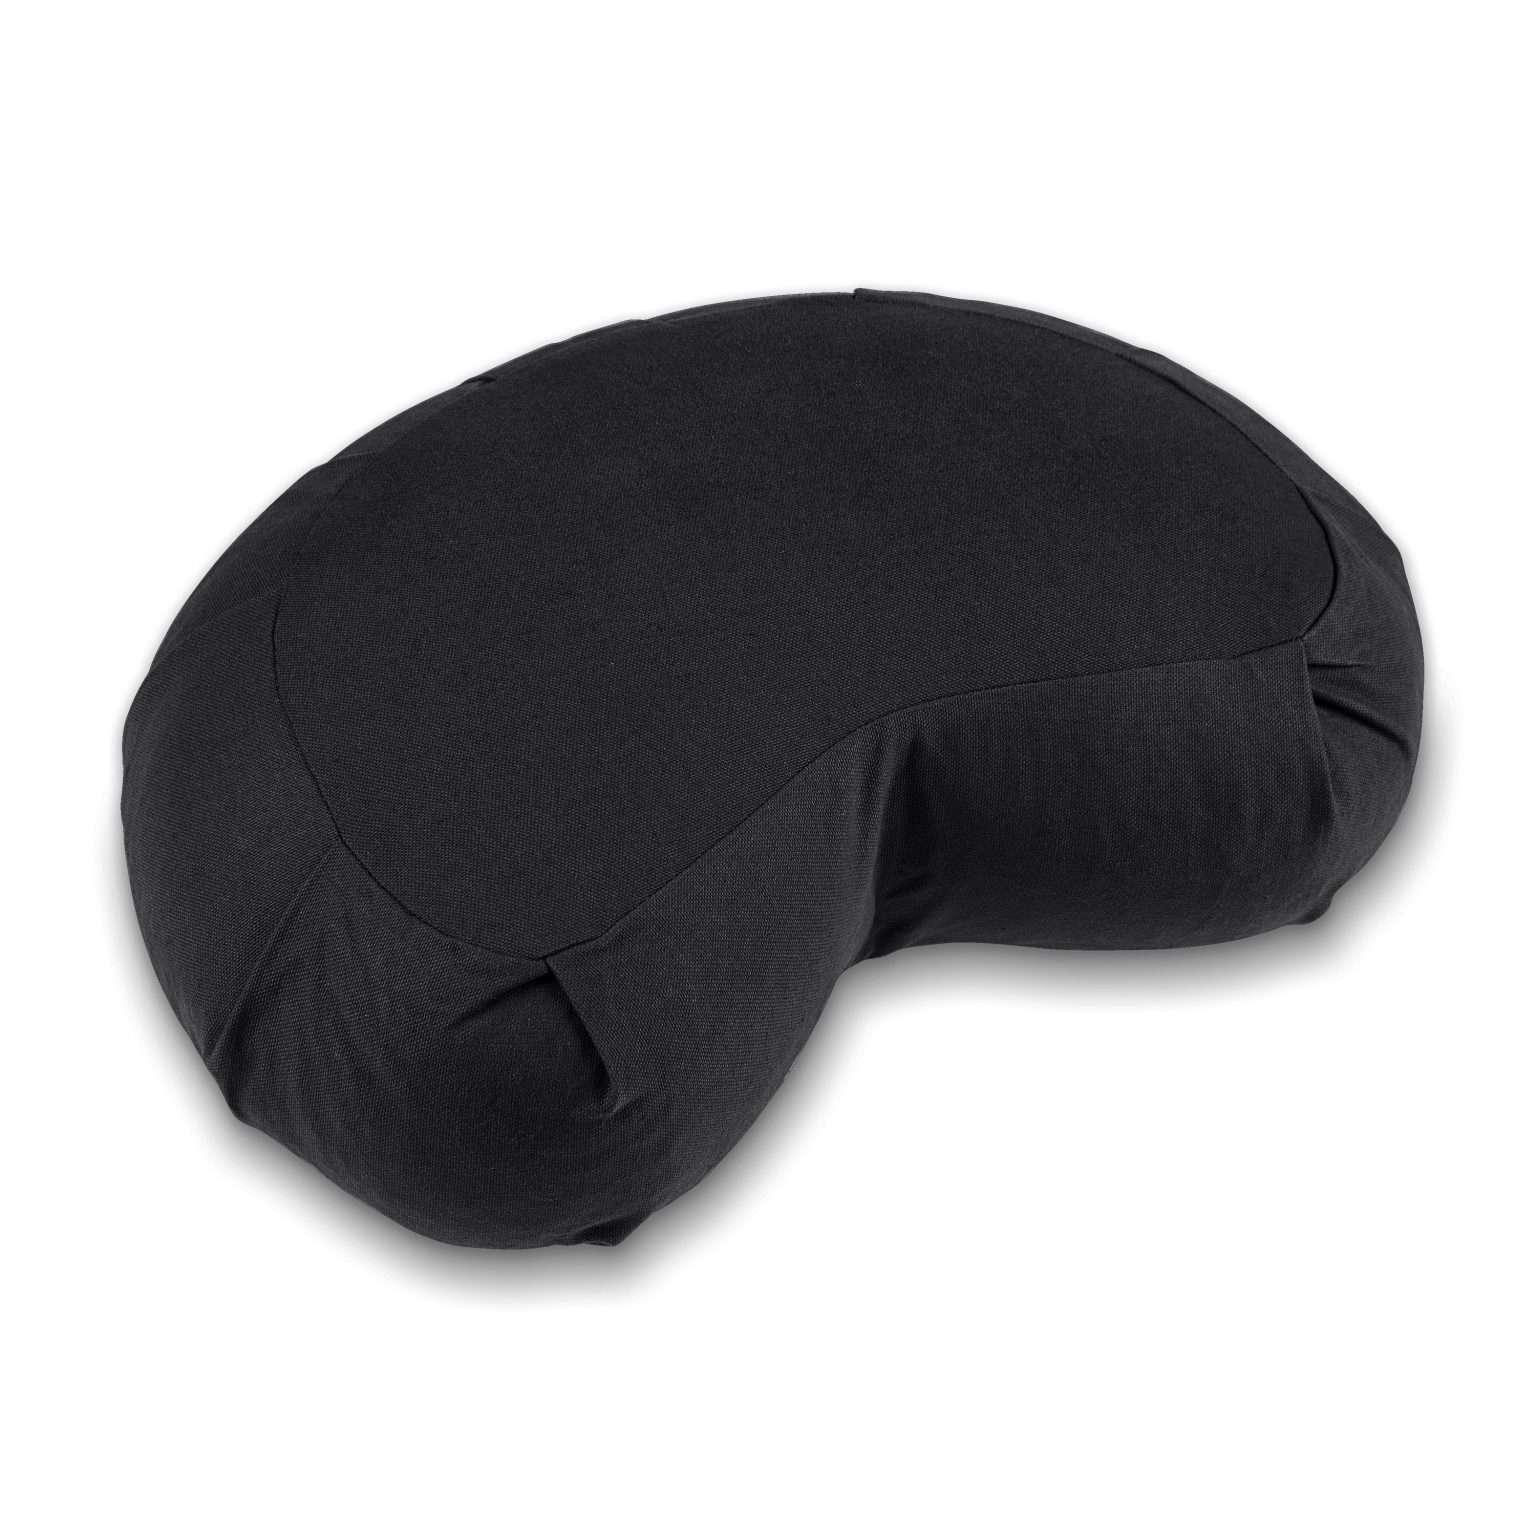 Lotuscrafts Zafu Siddha half crescent meditation cushion jet black